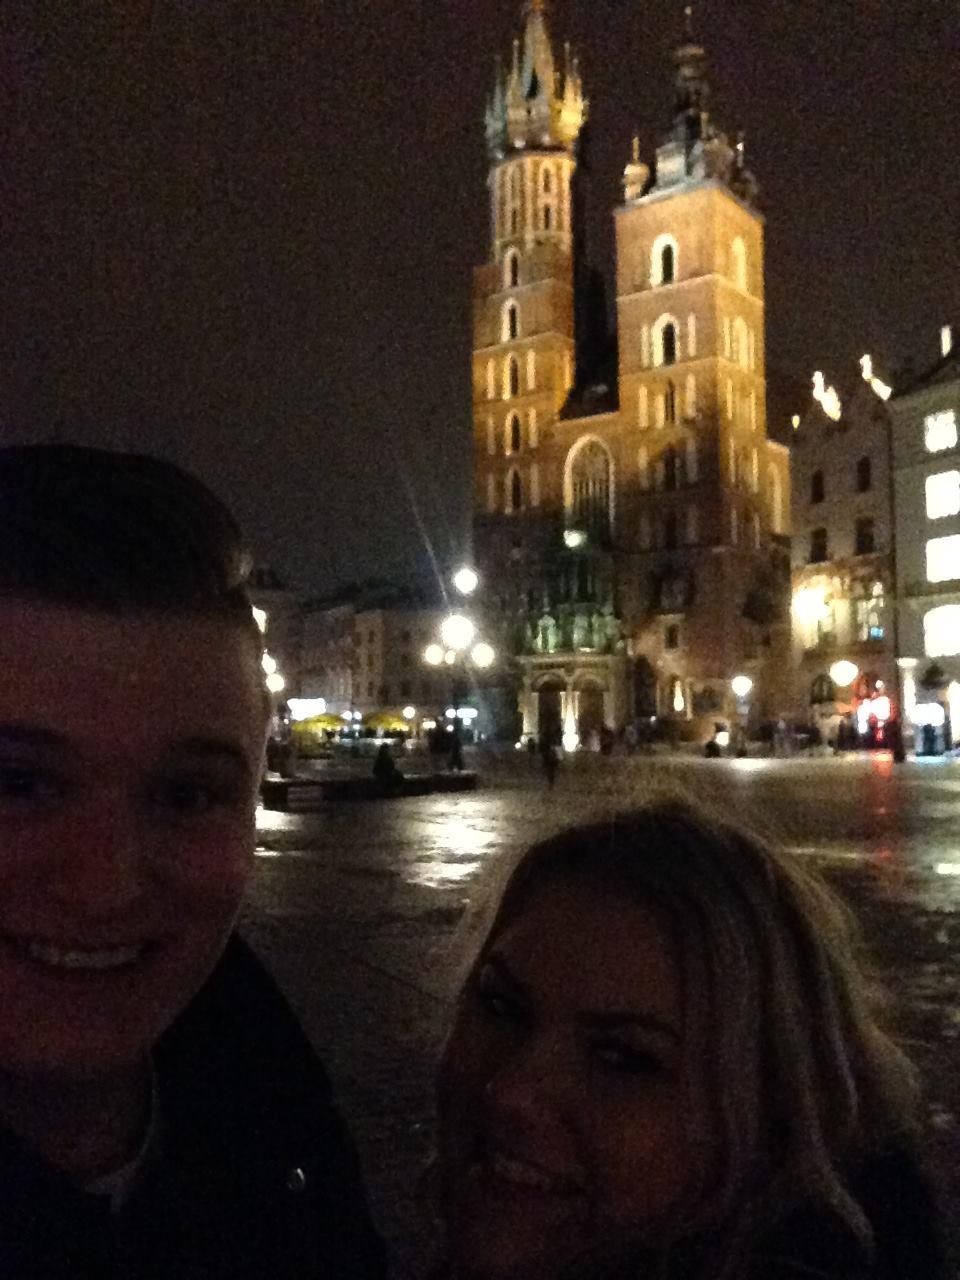 St-Marys-Basilica-Krakow-Poland-Selfie